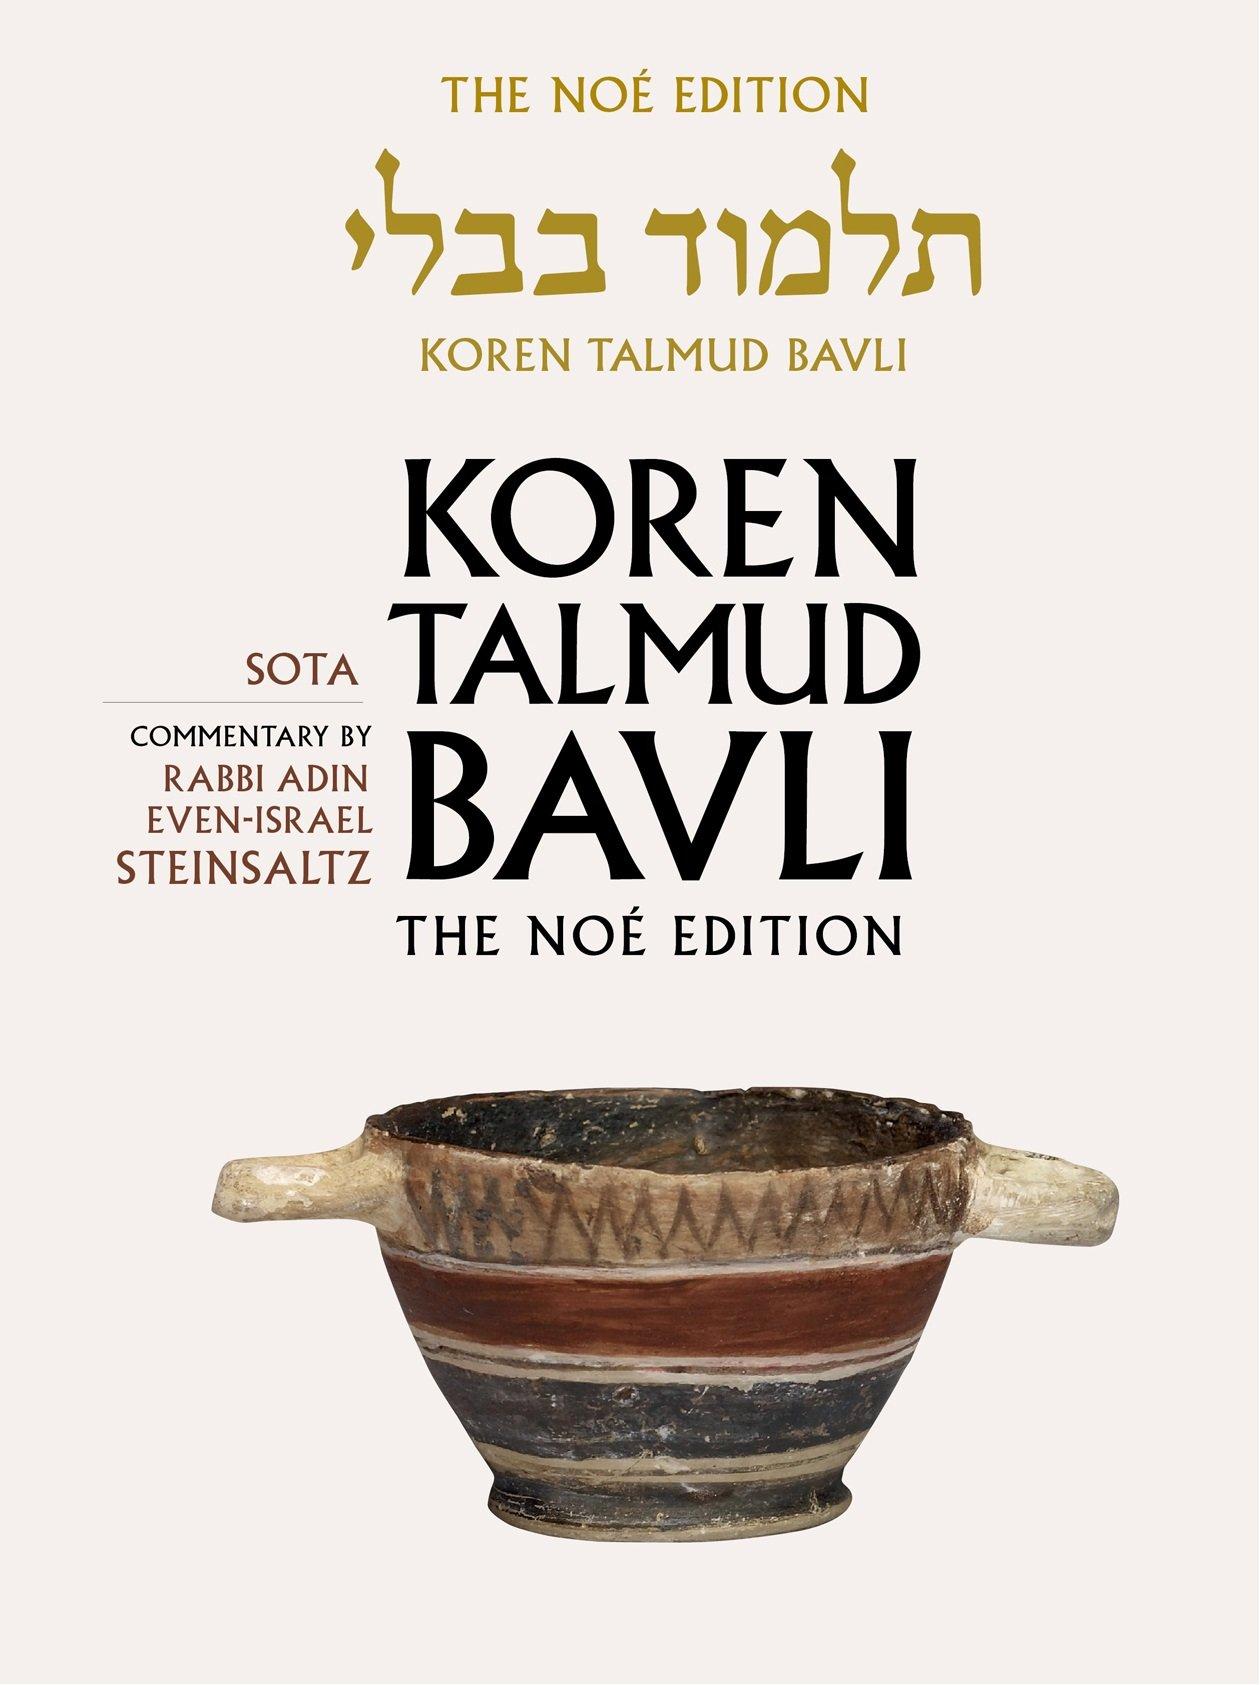 Koren Talmud Bavli, Noé Edition, Vol 20: Sota, Hebrew/English, Large, Color (Hebrew and English Edition) ebook